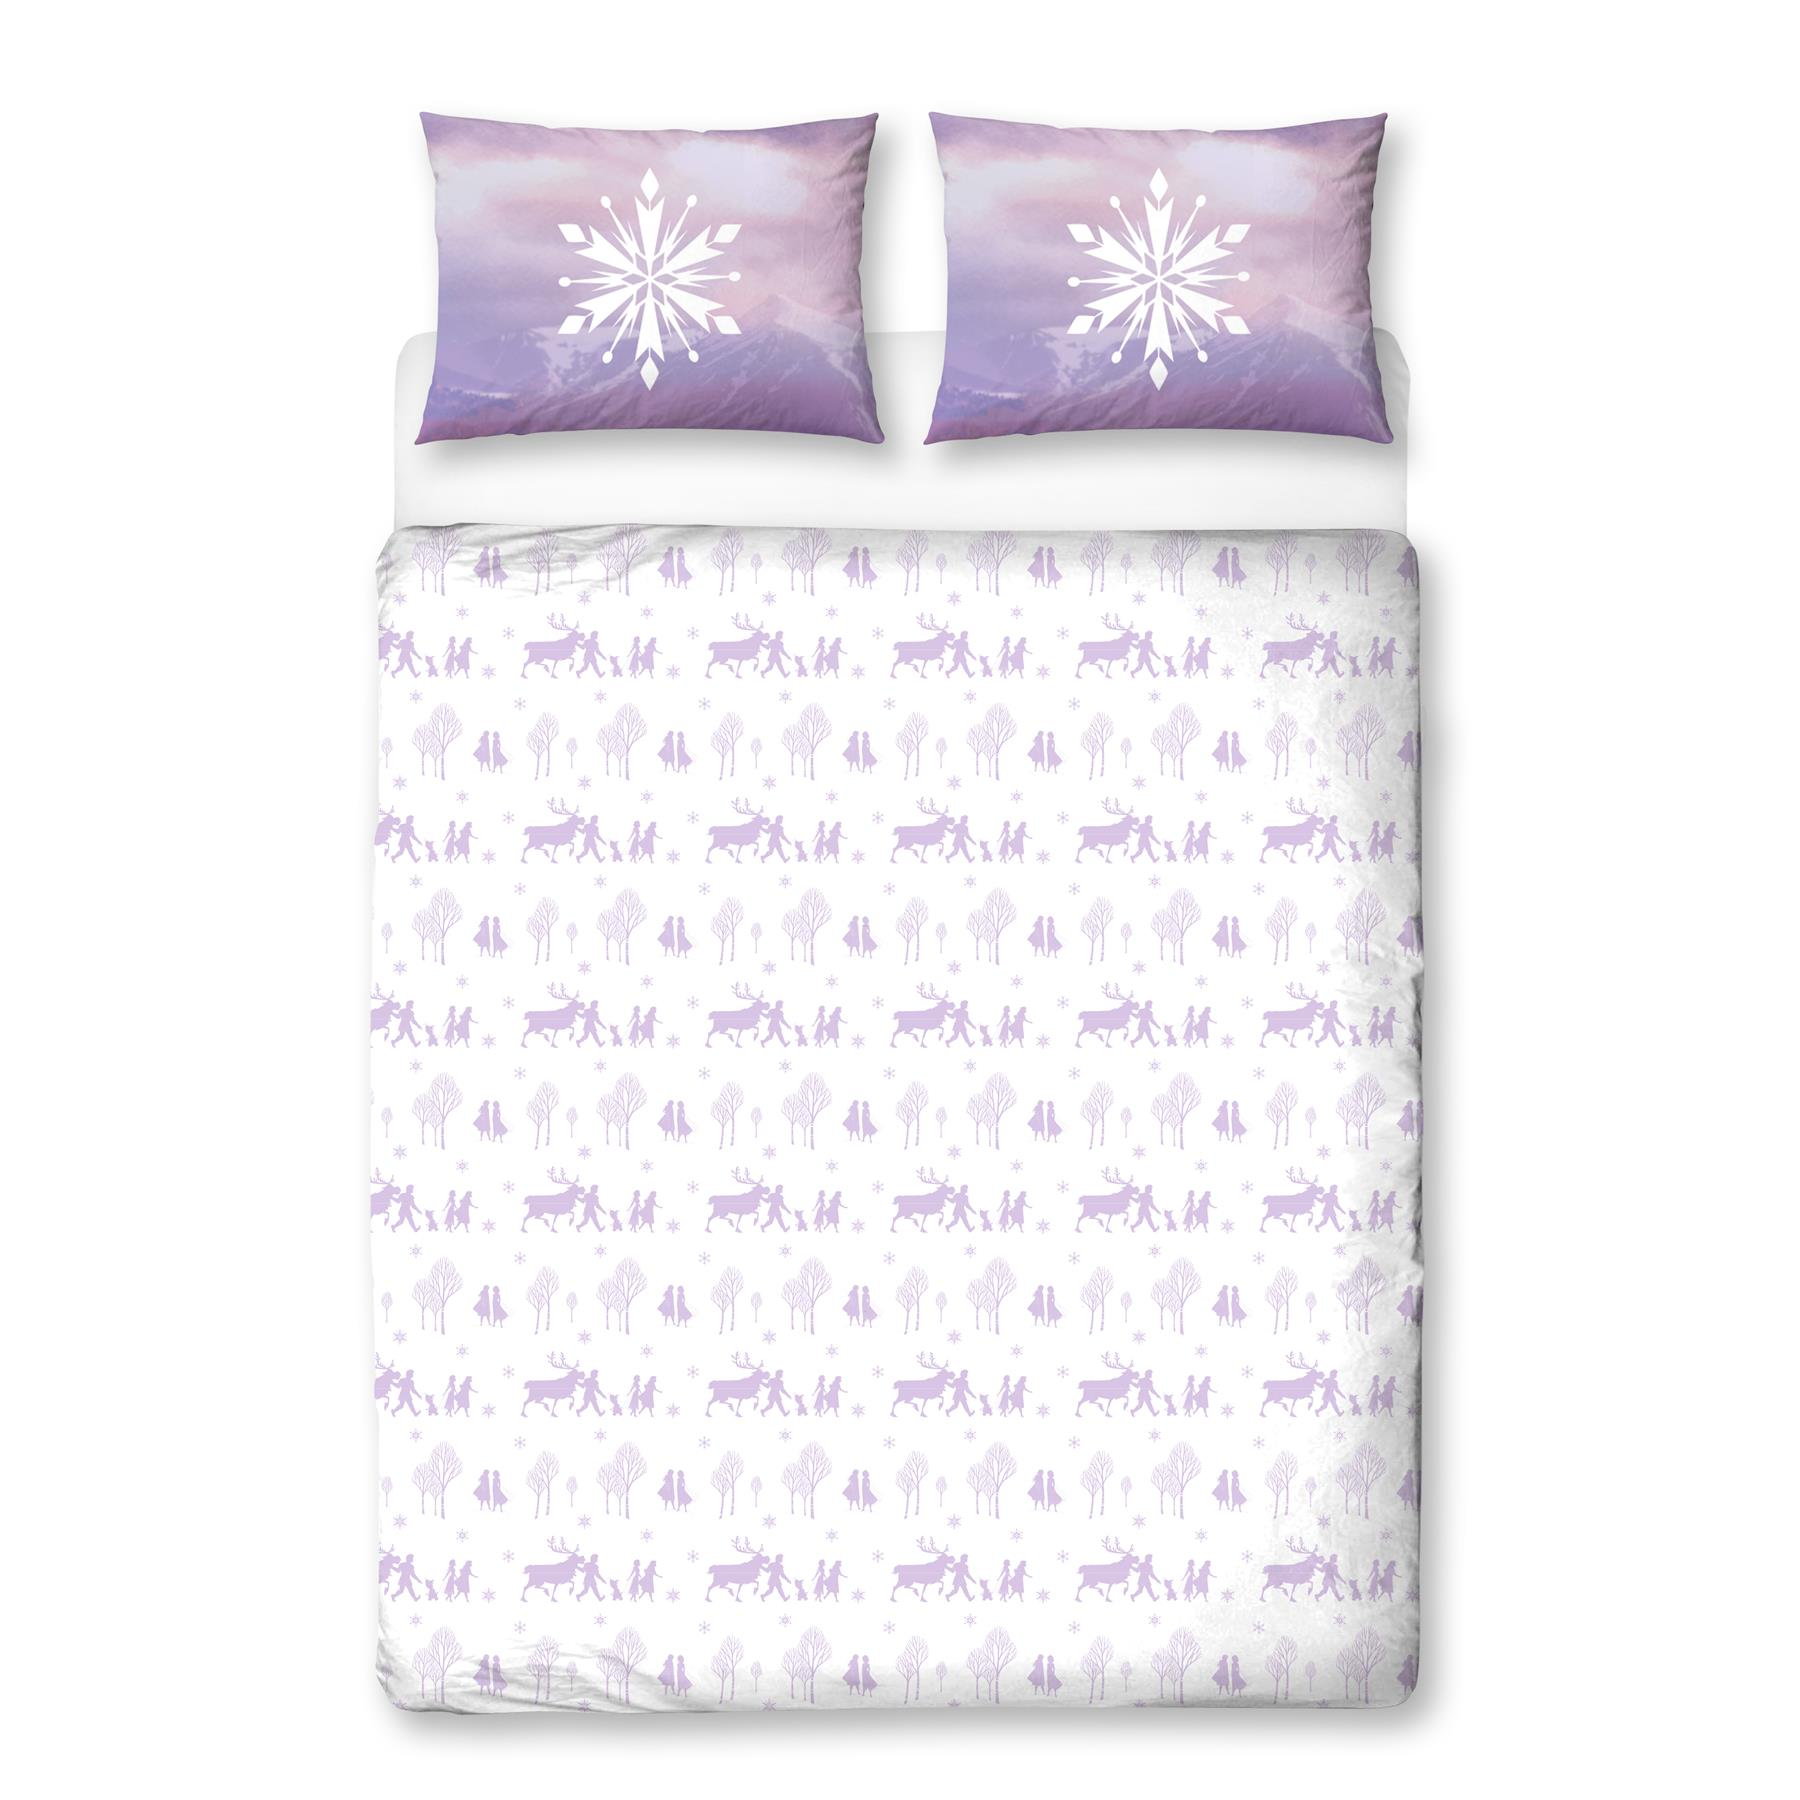 Official-Frozen-2-Duvet-Covers-Single-Double-Reversible-Bedding-Elsa-Anna-Olaf thumbnail 11